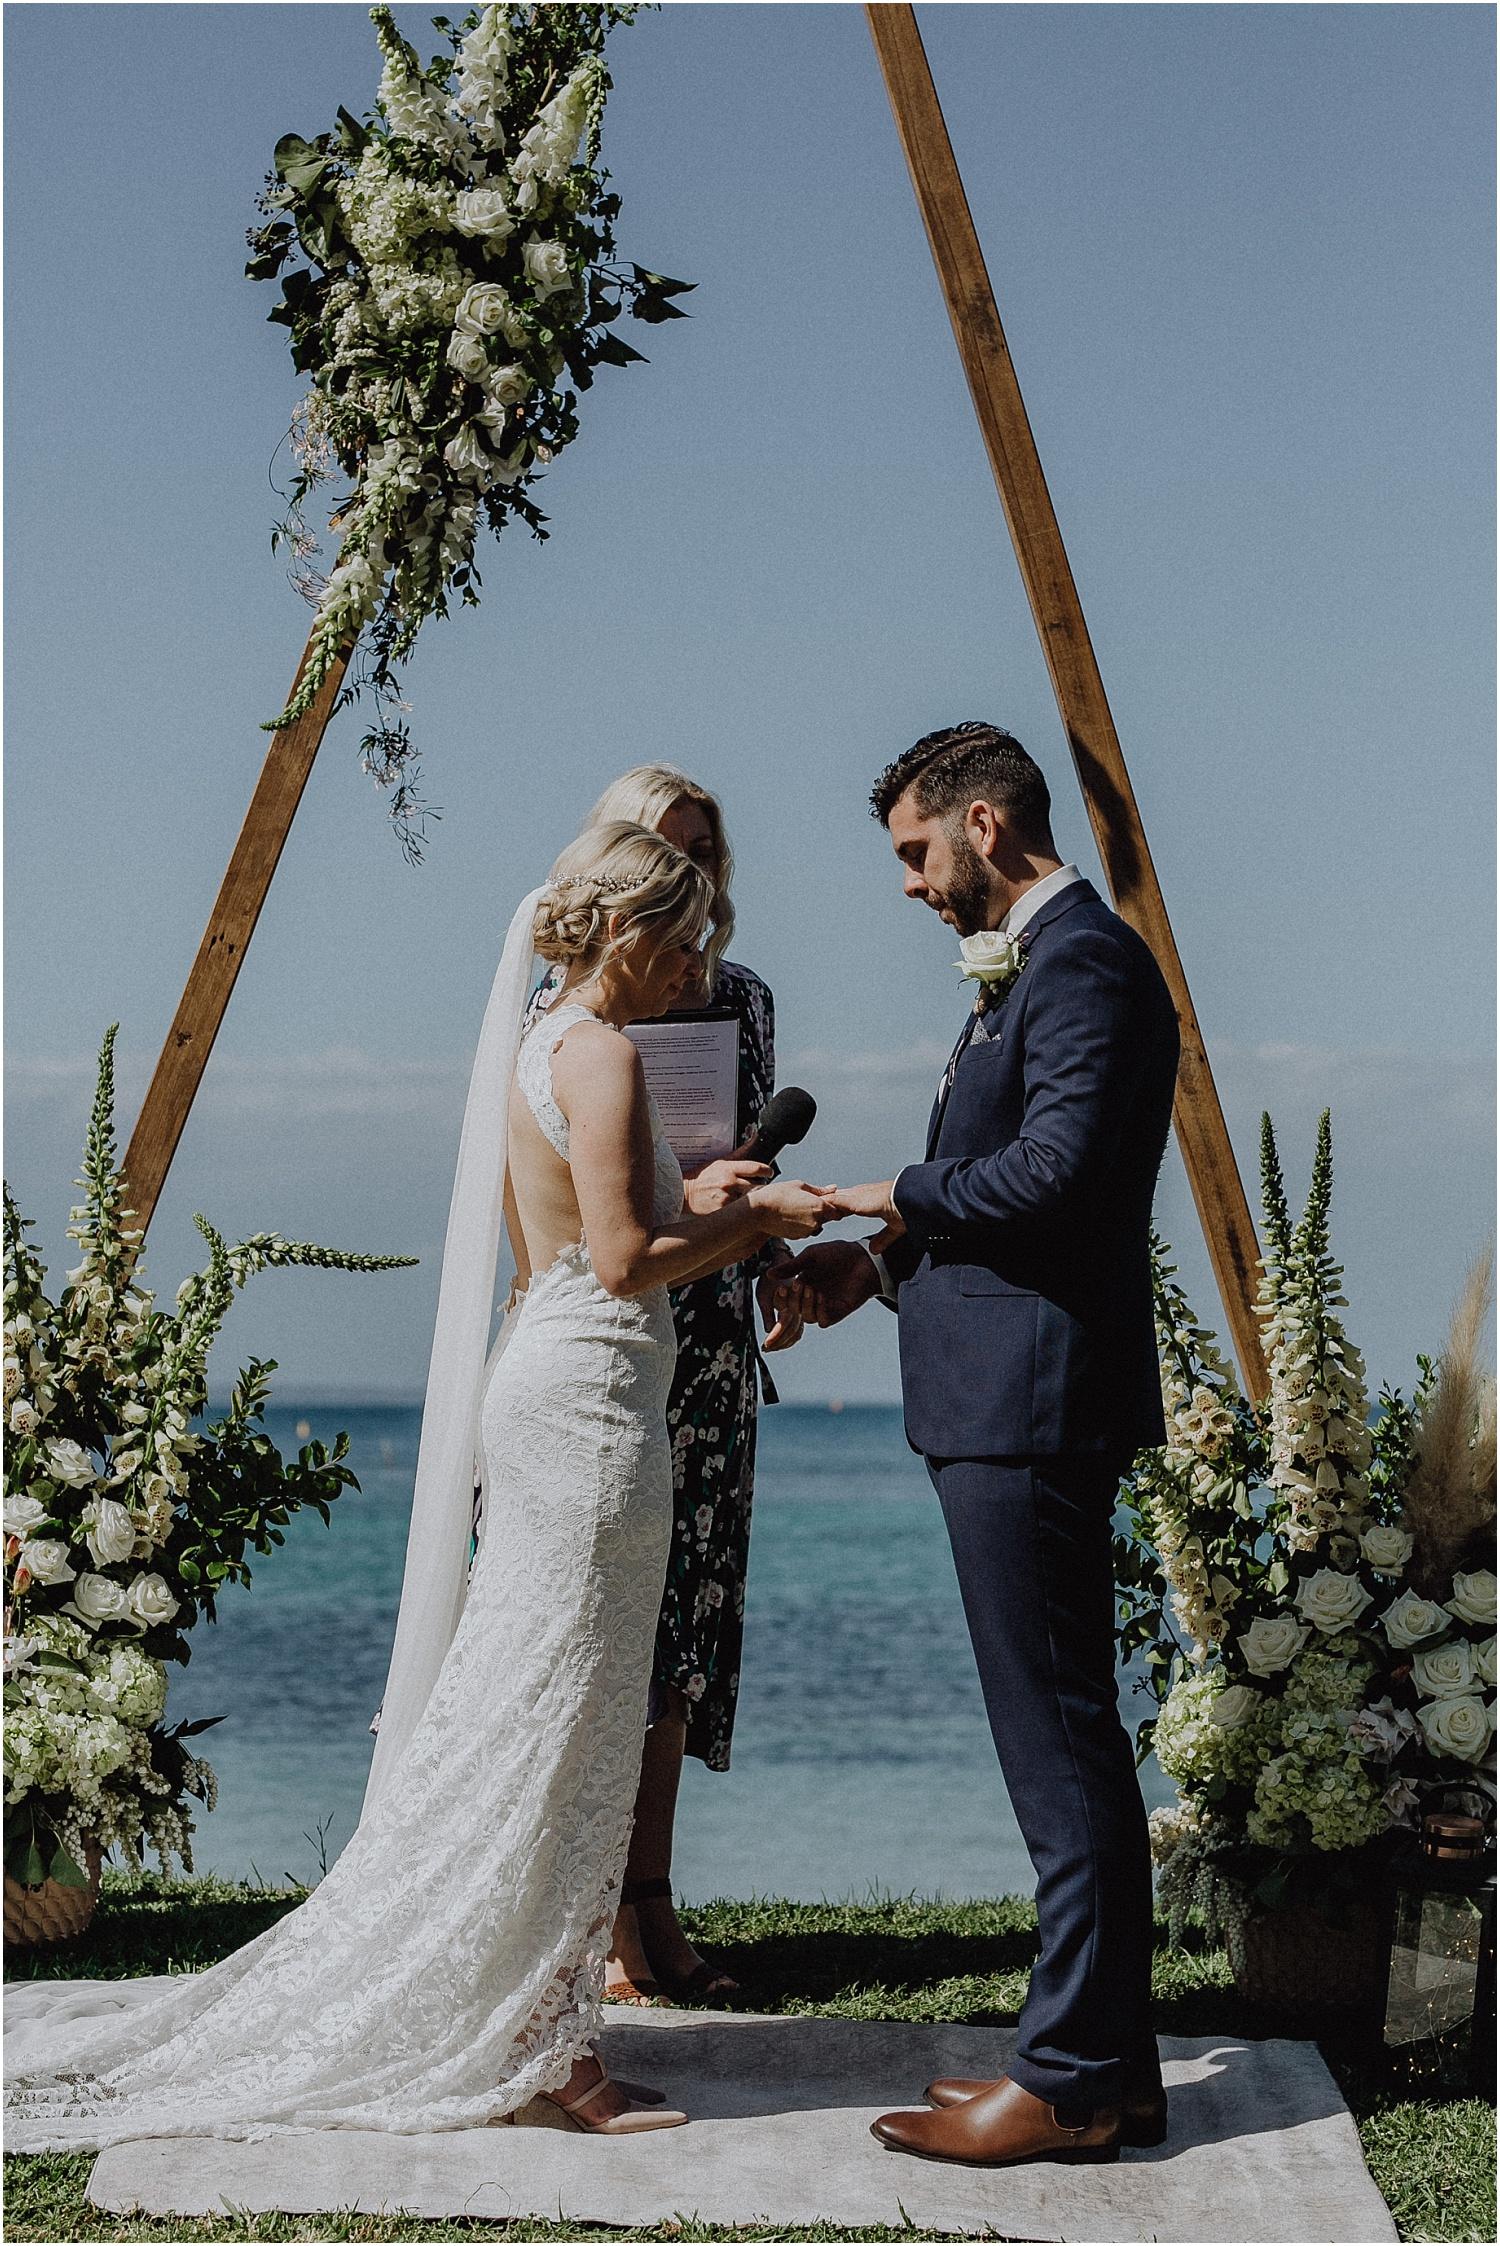 Nicolle and Damien's tipi wedding at the Flinders Yacht Club on the Mornington Peninsula._0080.jpg